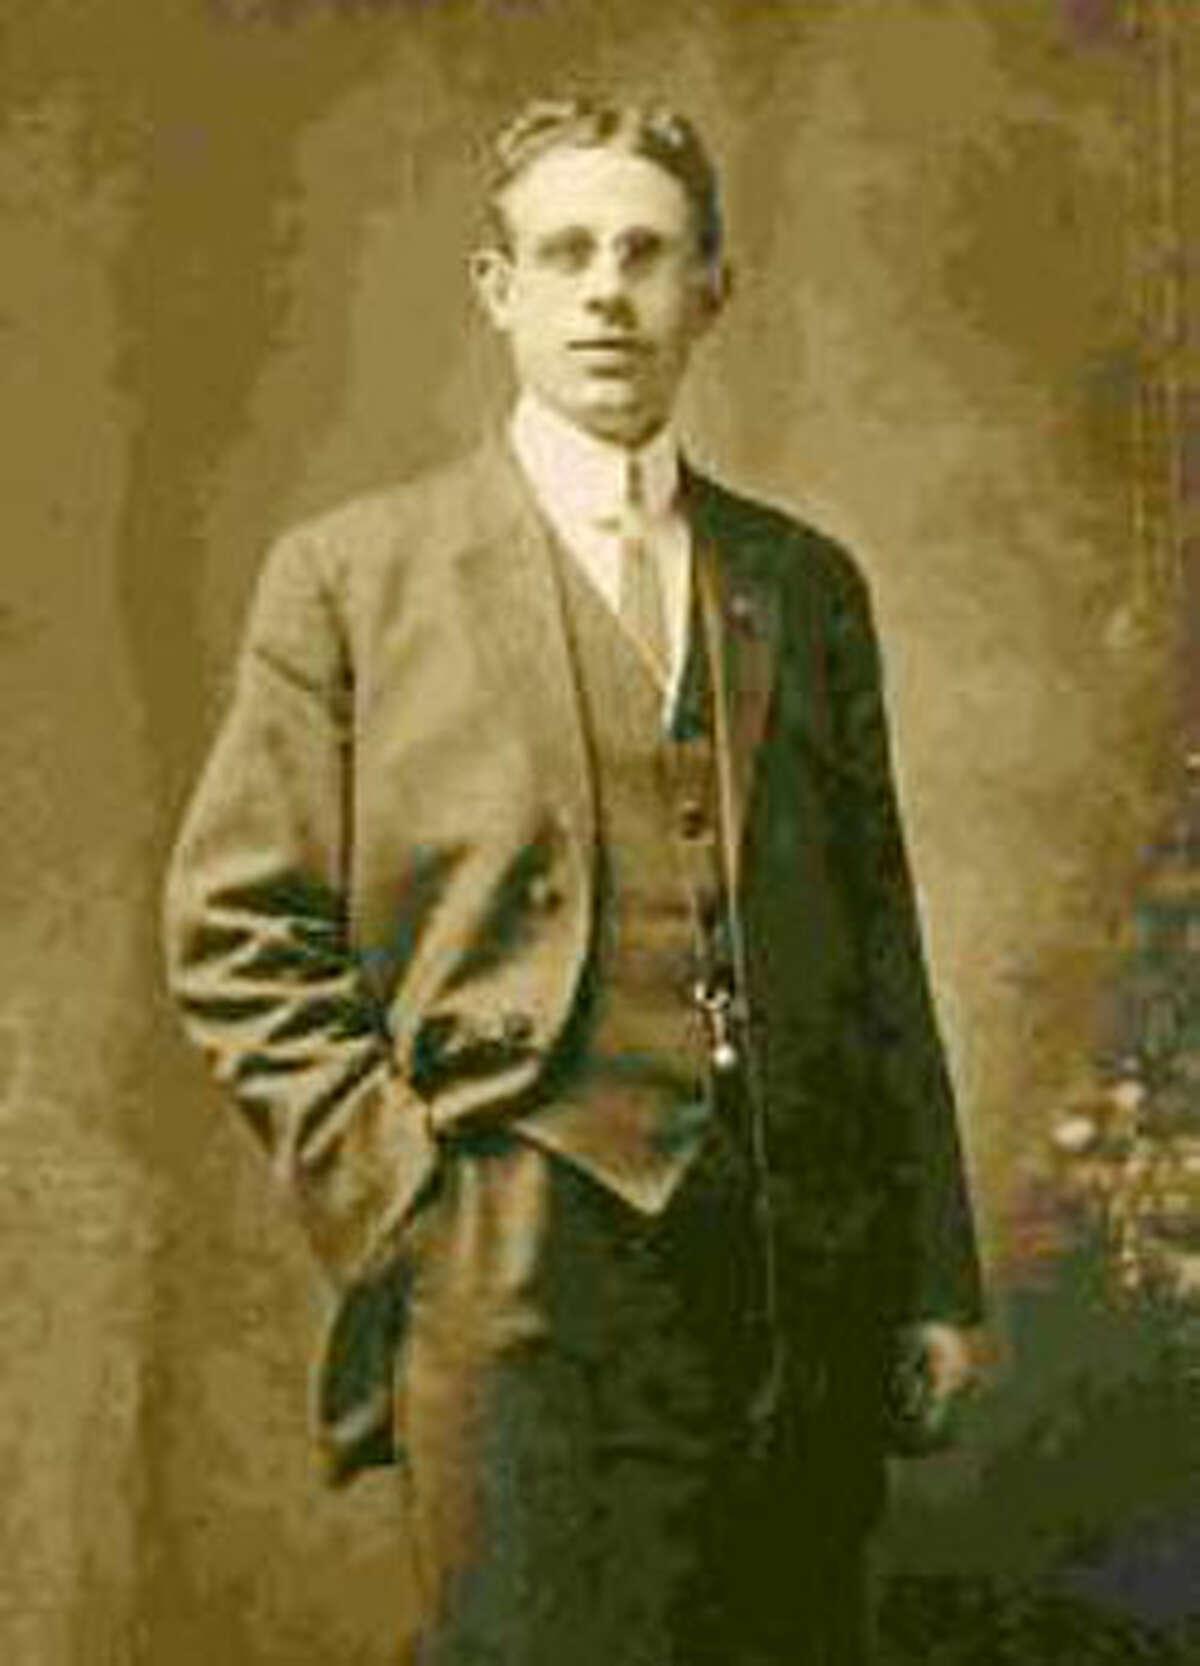 Titanic survivor Oscar Palmquist